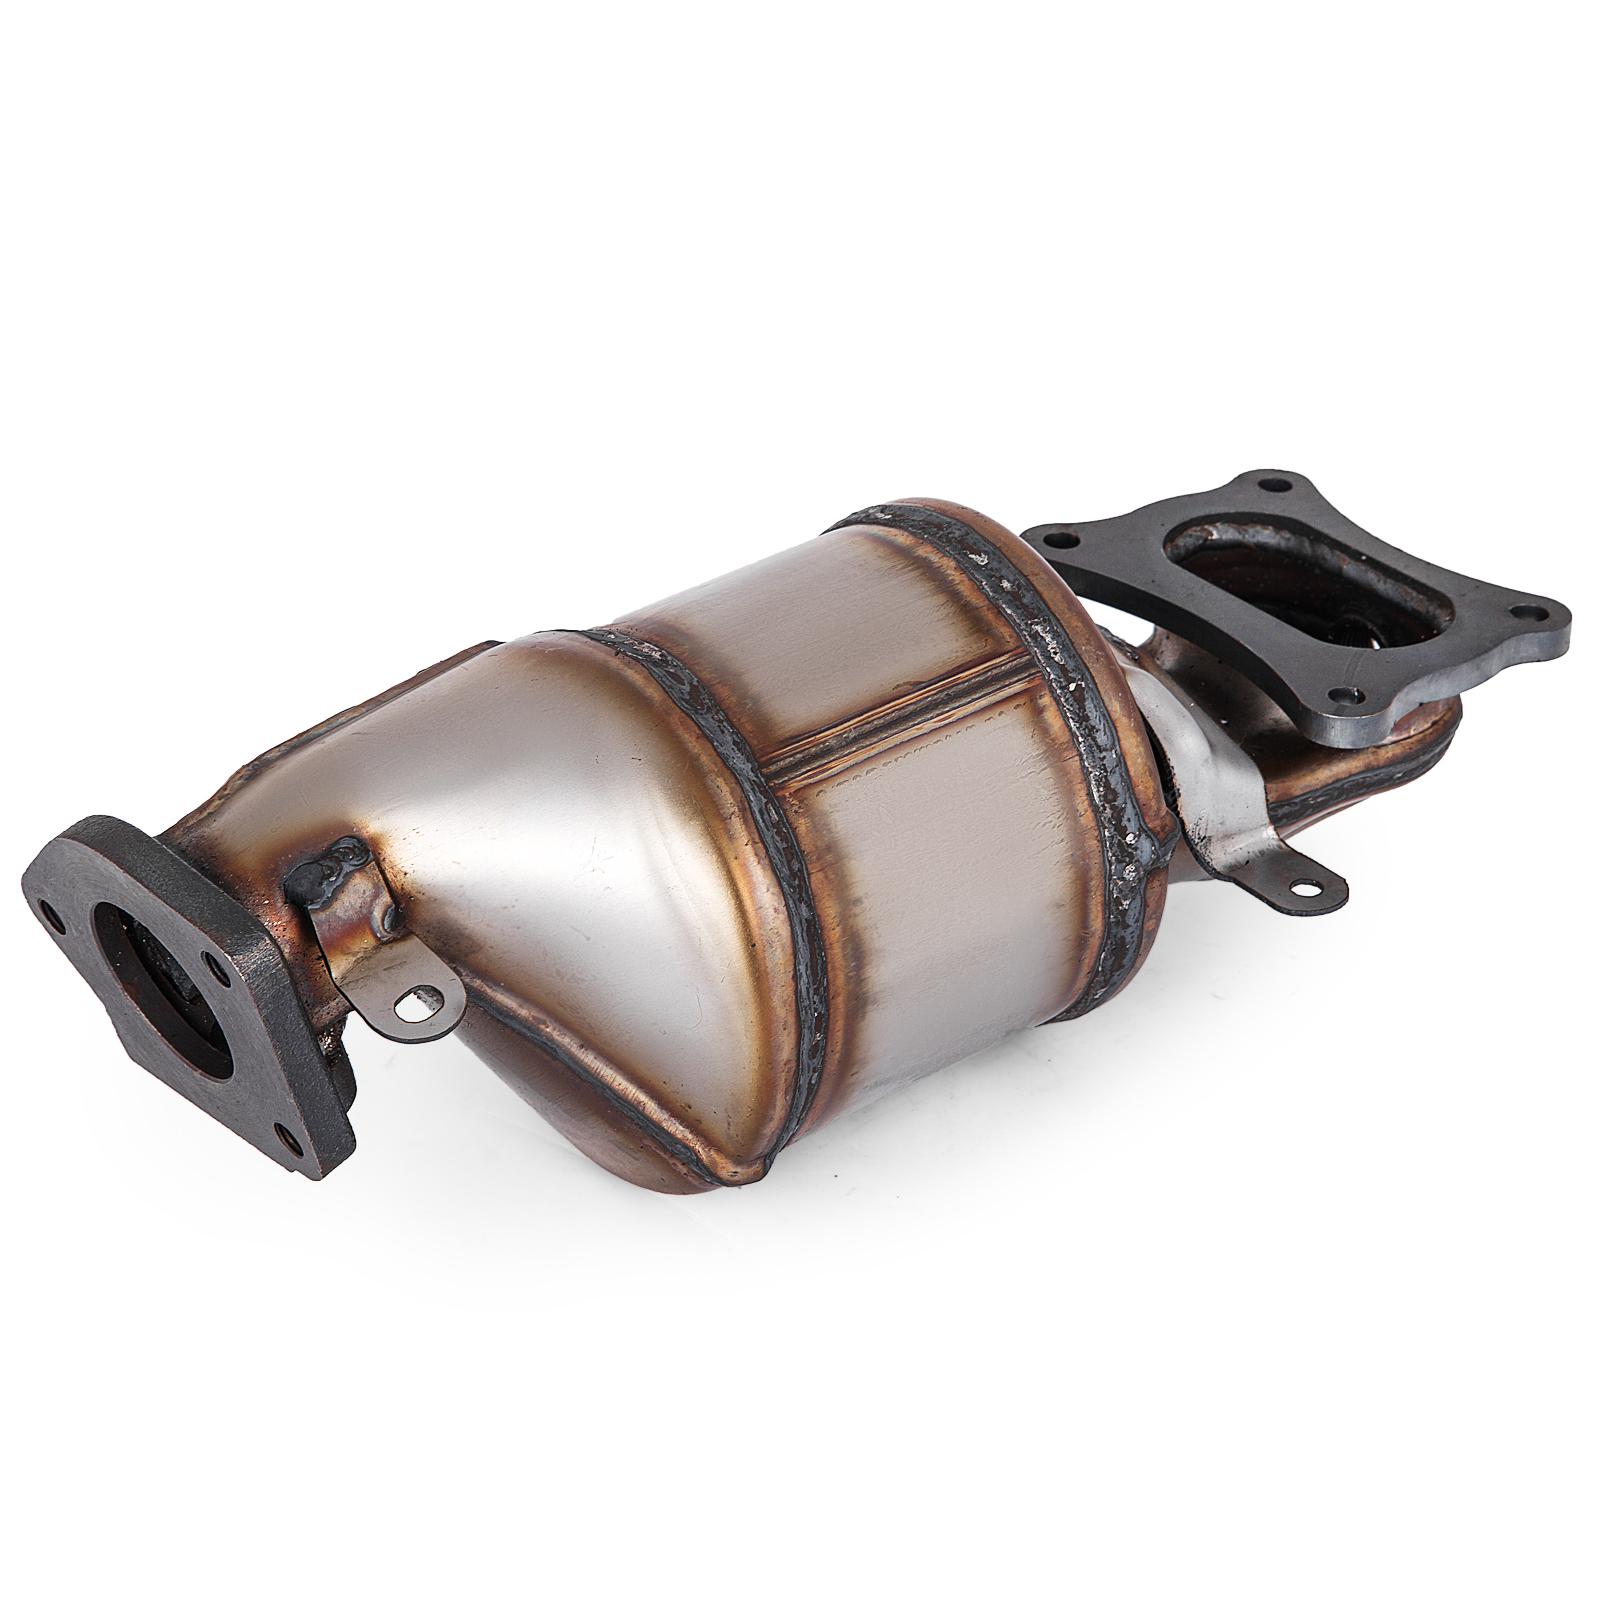 OEM Catalytic Converter For Honda Pilot Acura MDX TL 3.5L